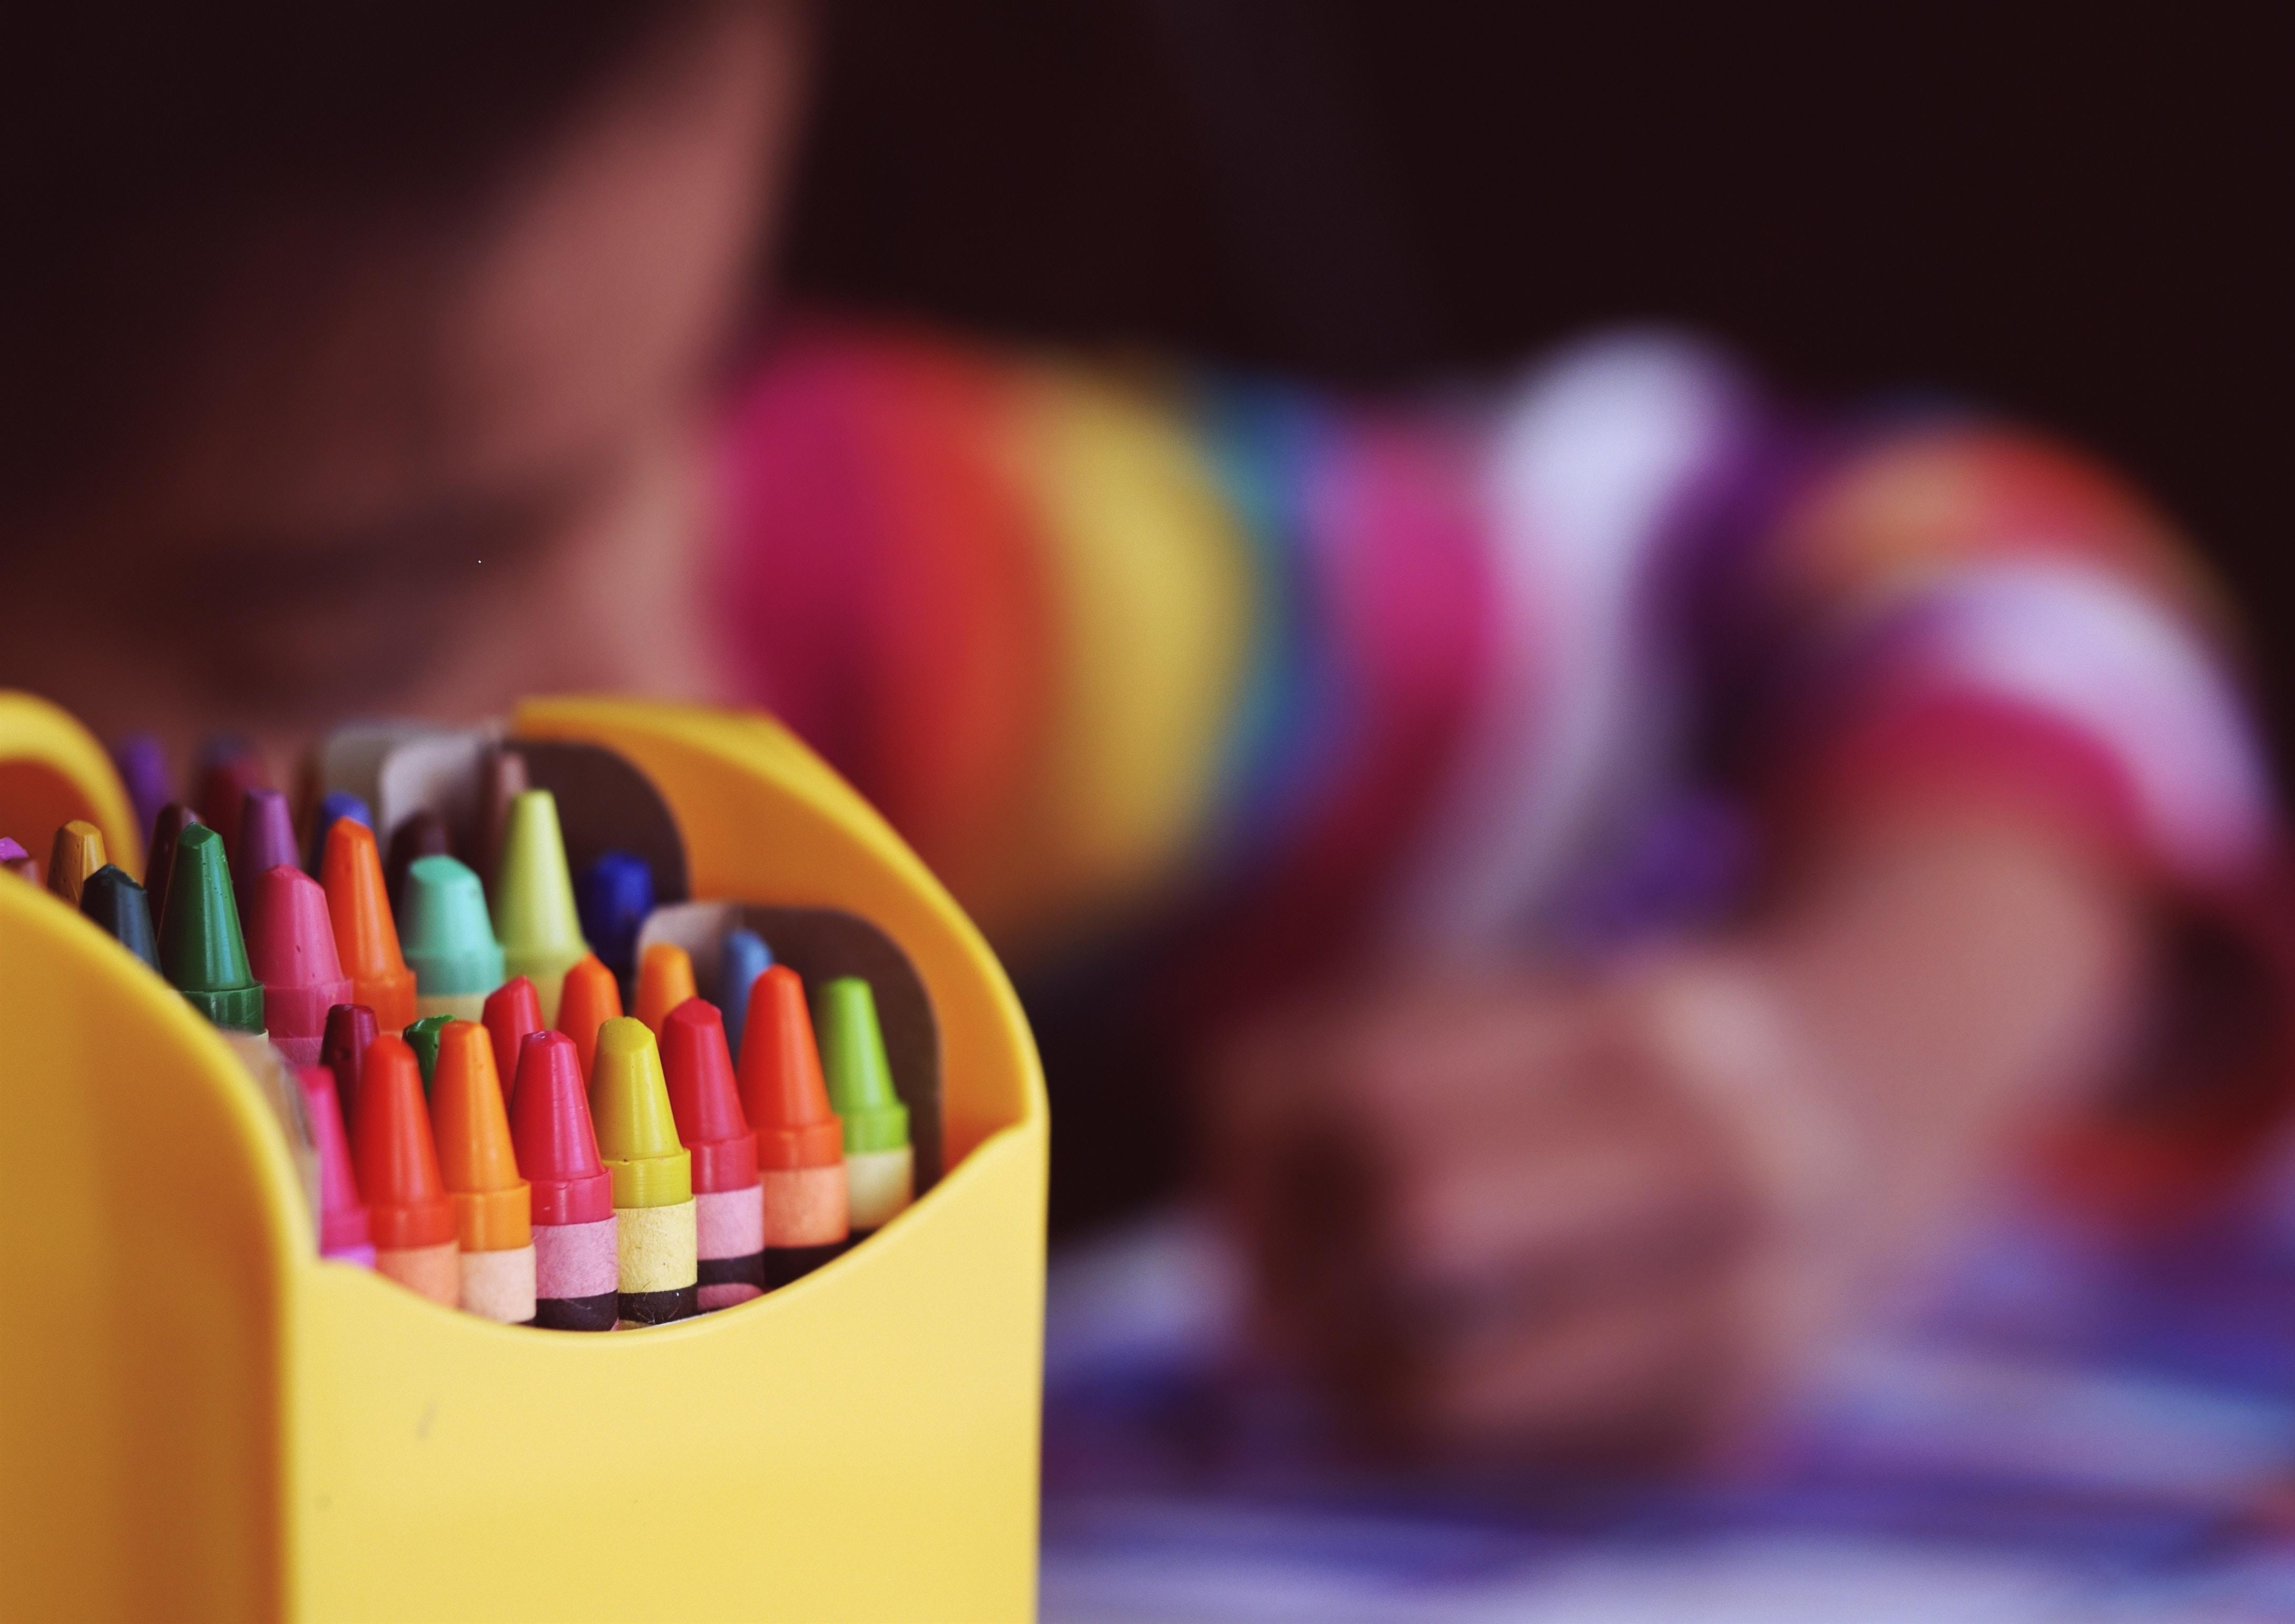 box of crayons boy in backrgound